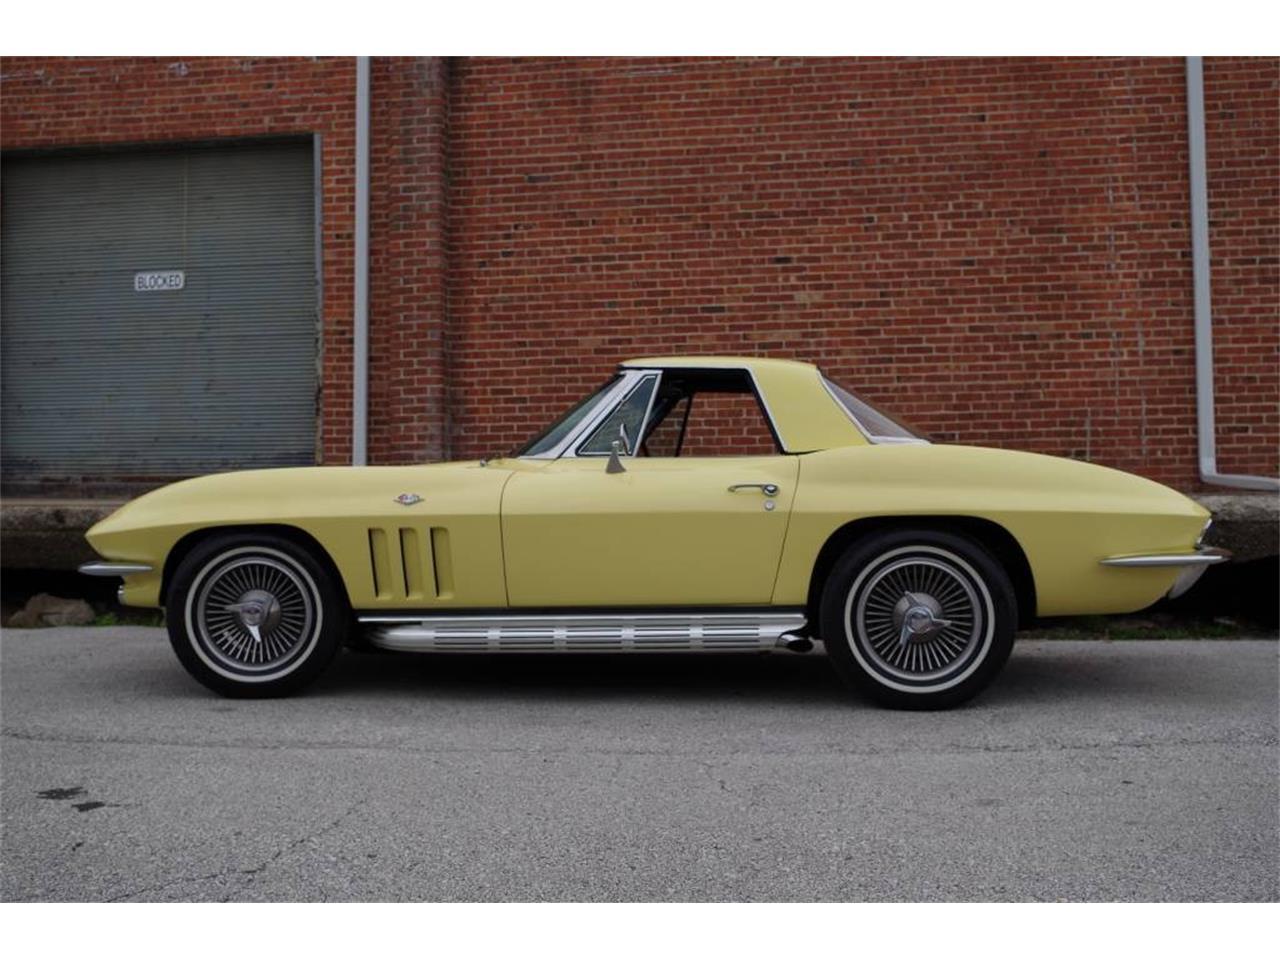 Large Picture of Classic '66 Corvette located in Missouri - $69,900.00 - MO1Z